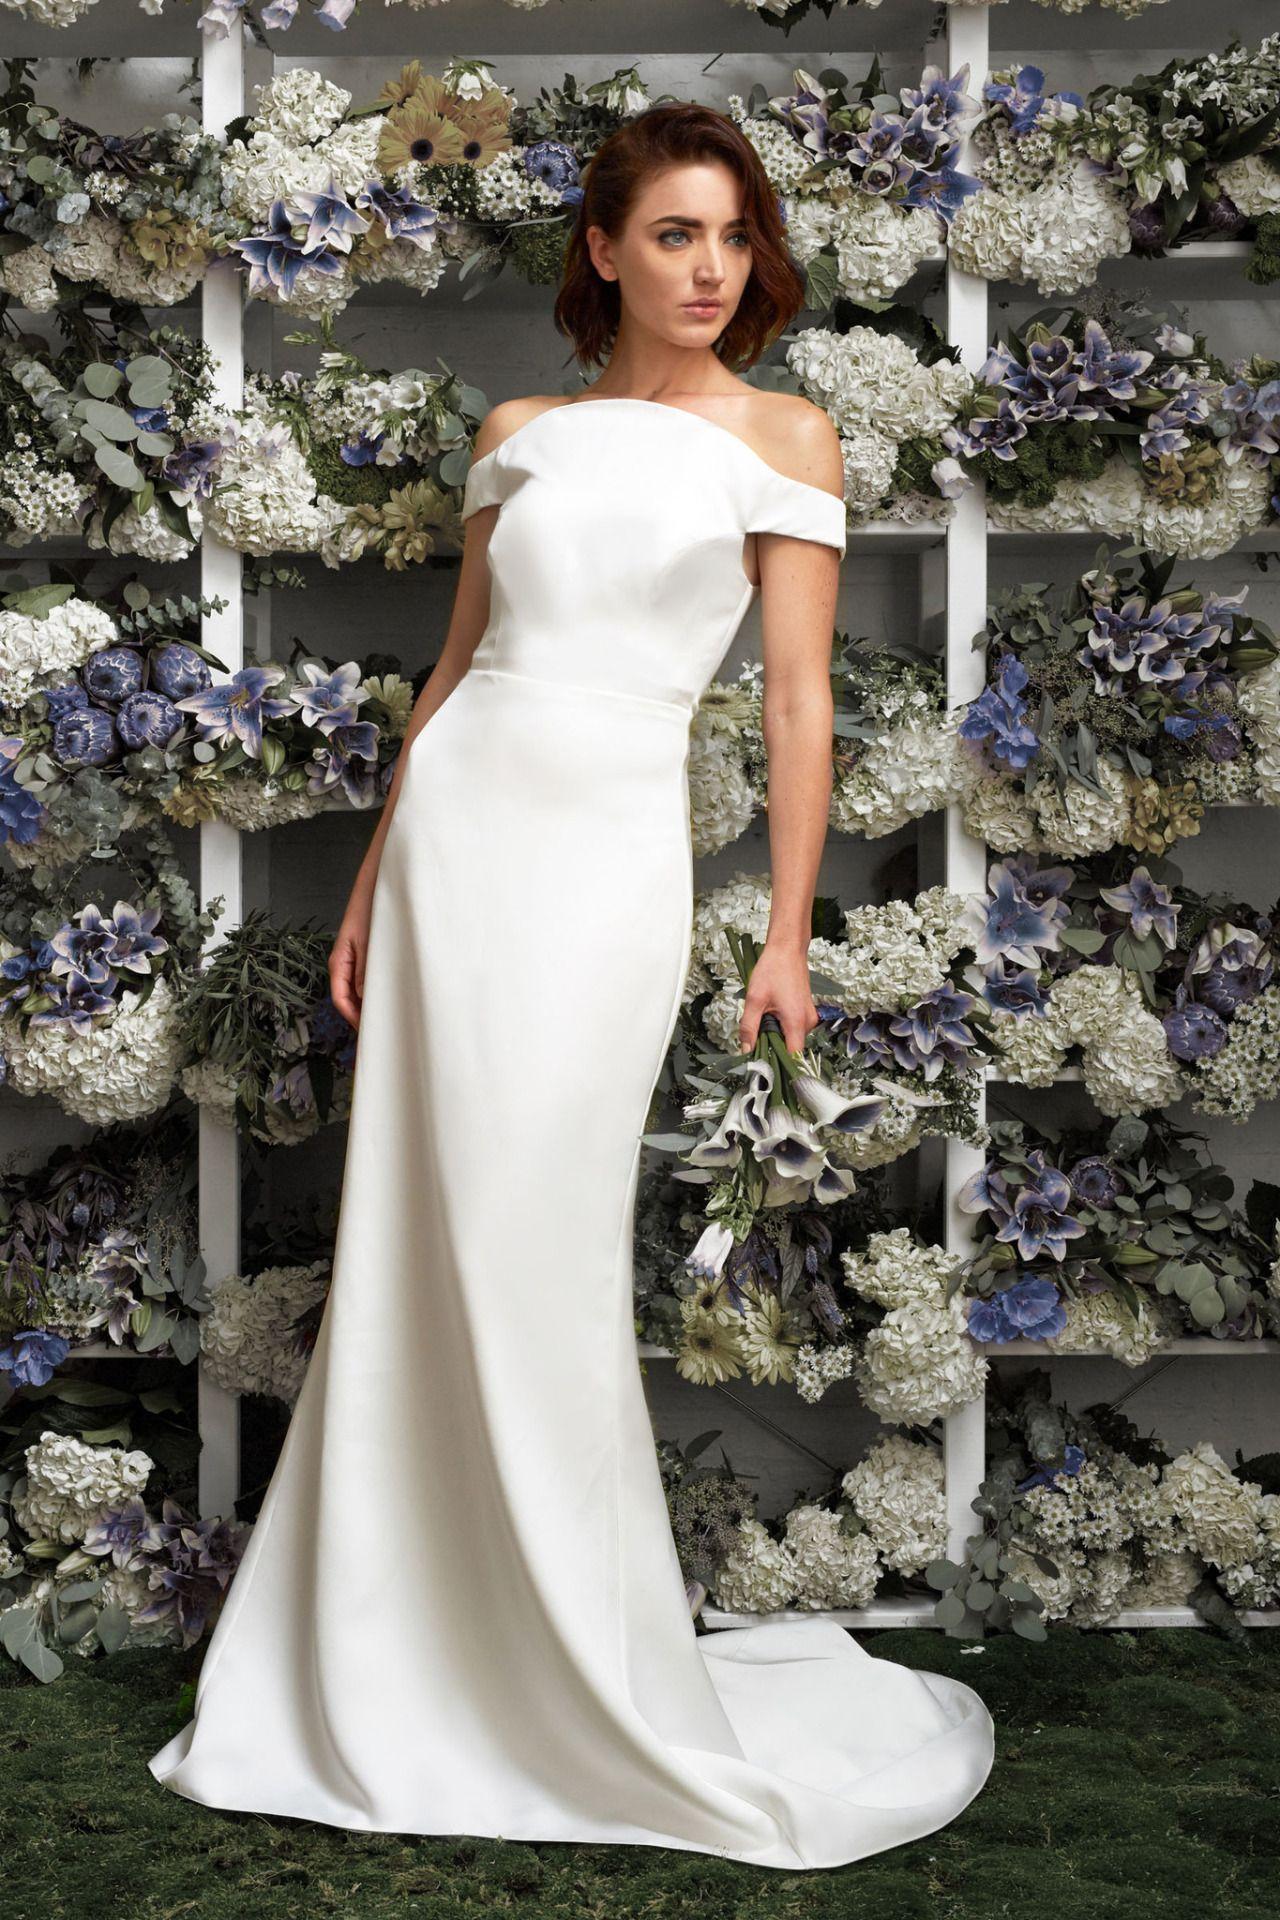 Winter wonderland wedding dress  Wedding Gown Closet  Fashion trending  Pinterest  Gowns